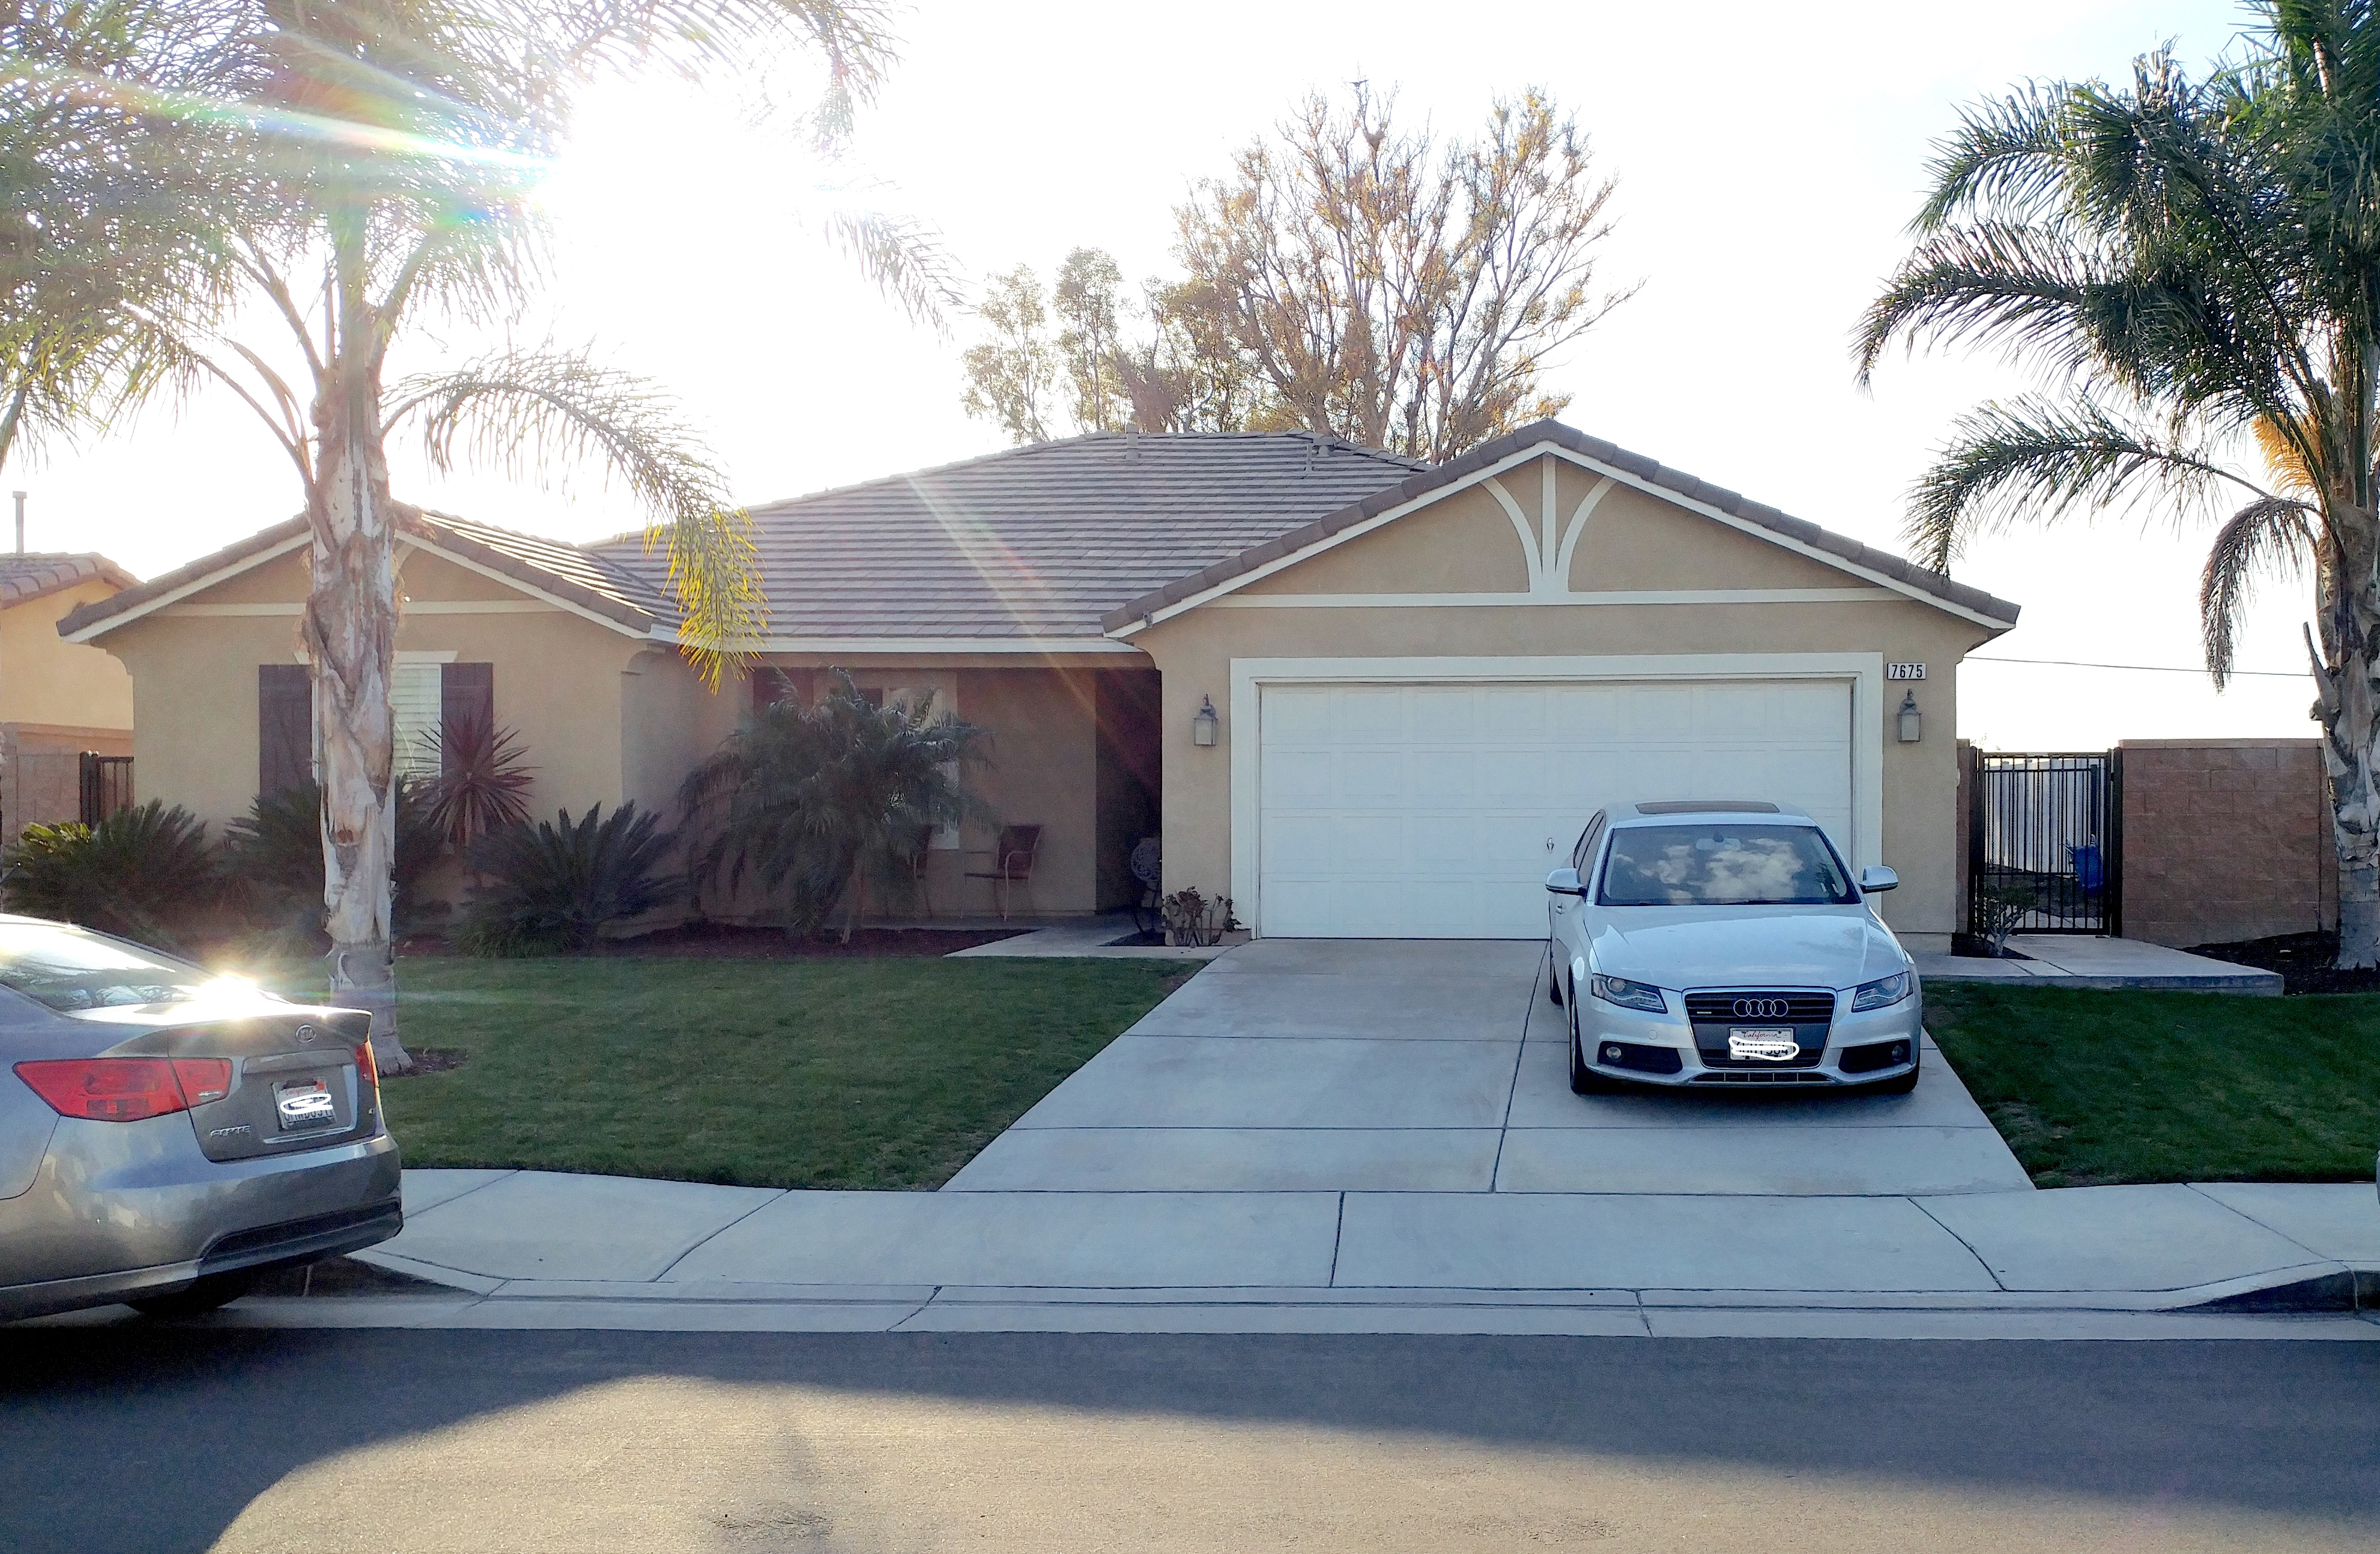 Photo of 7675 Swan Creek Dr, Corona, CA, 92880